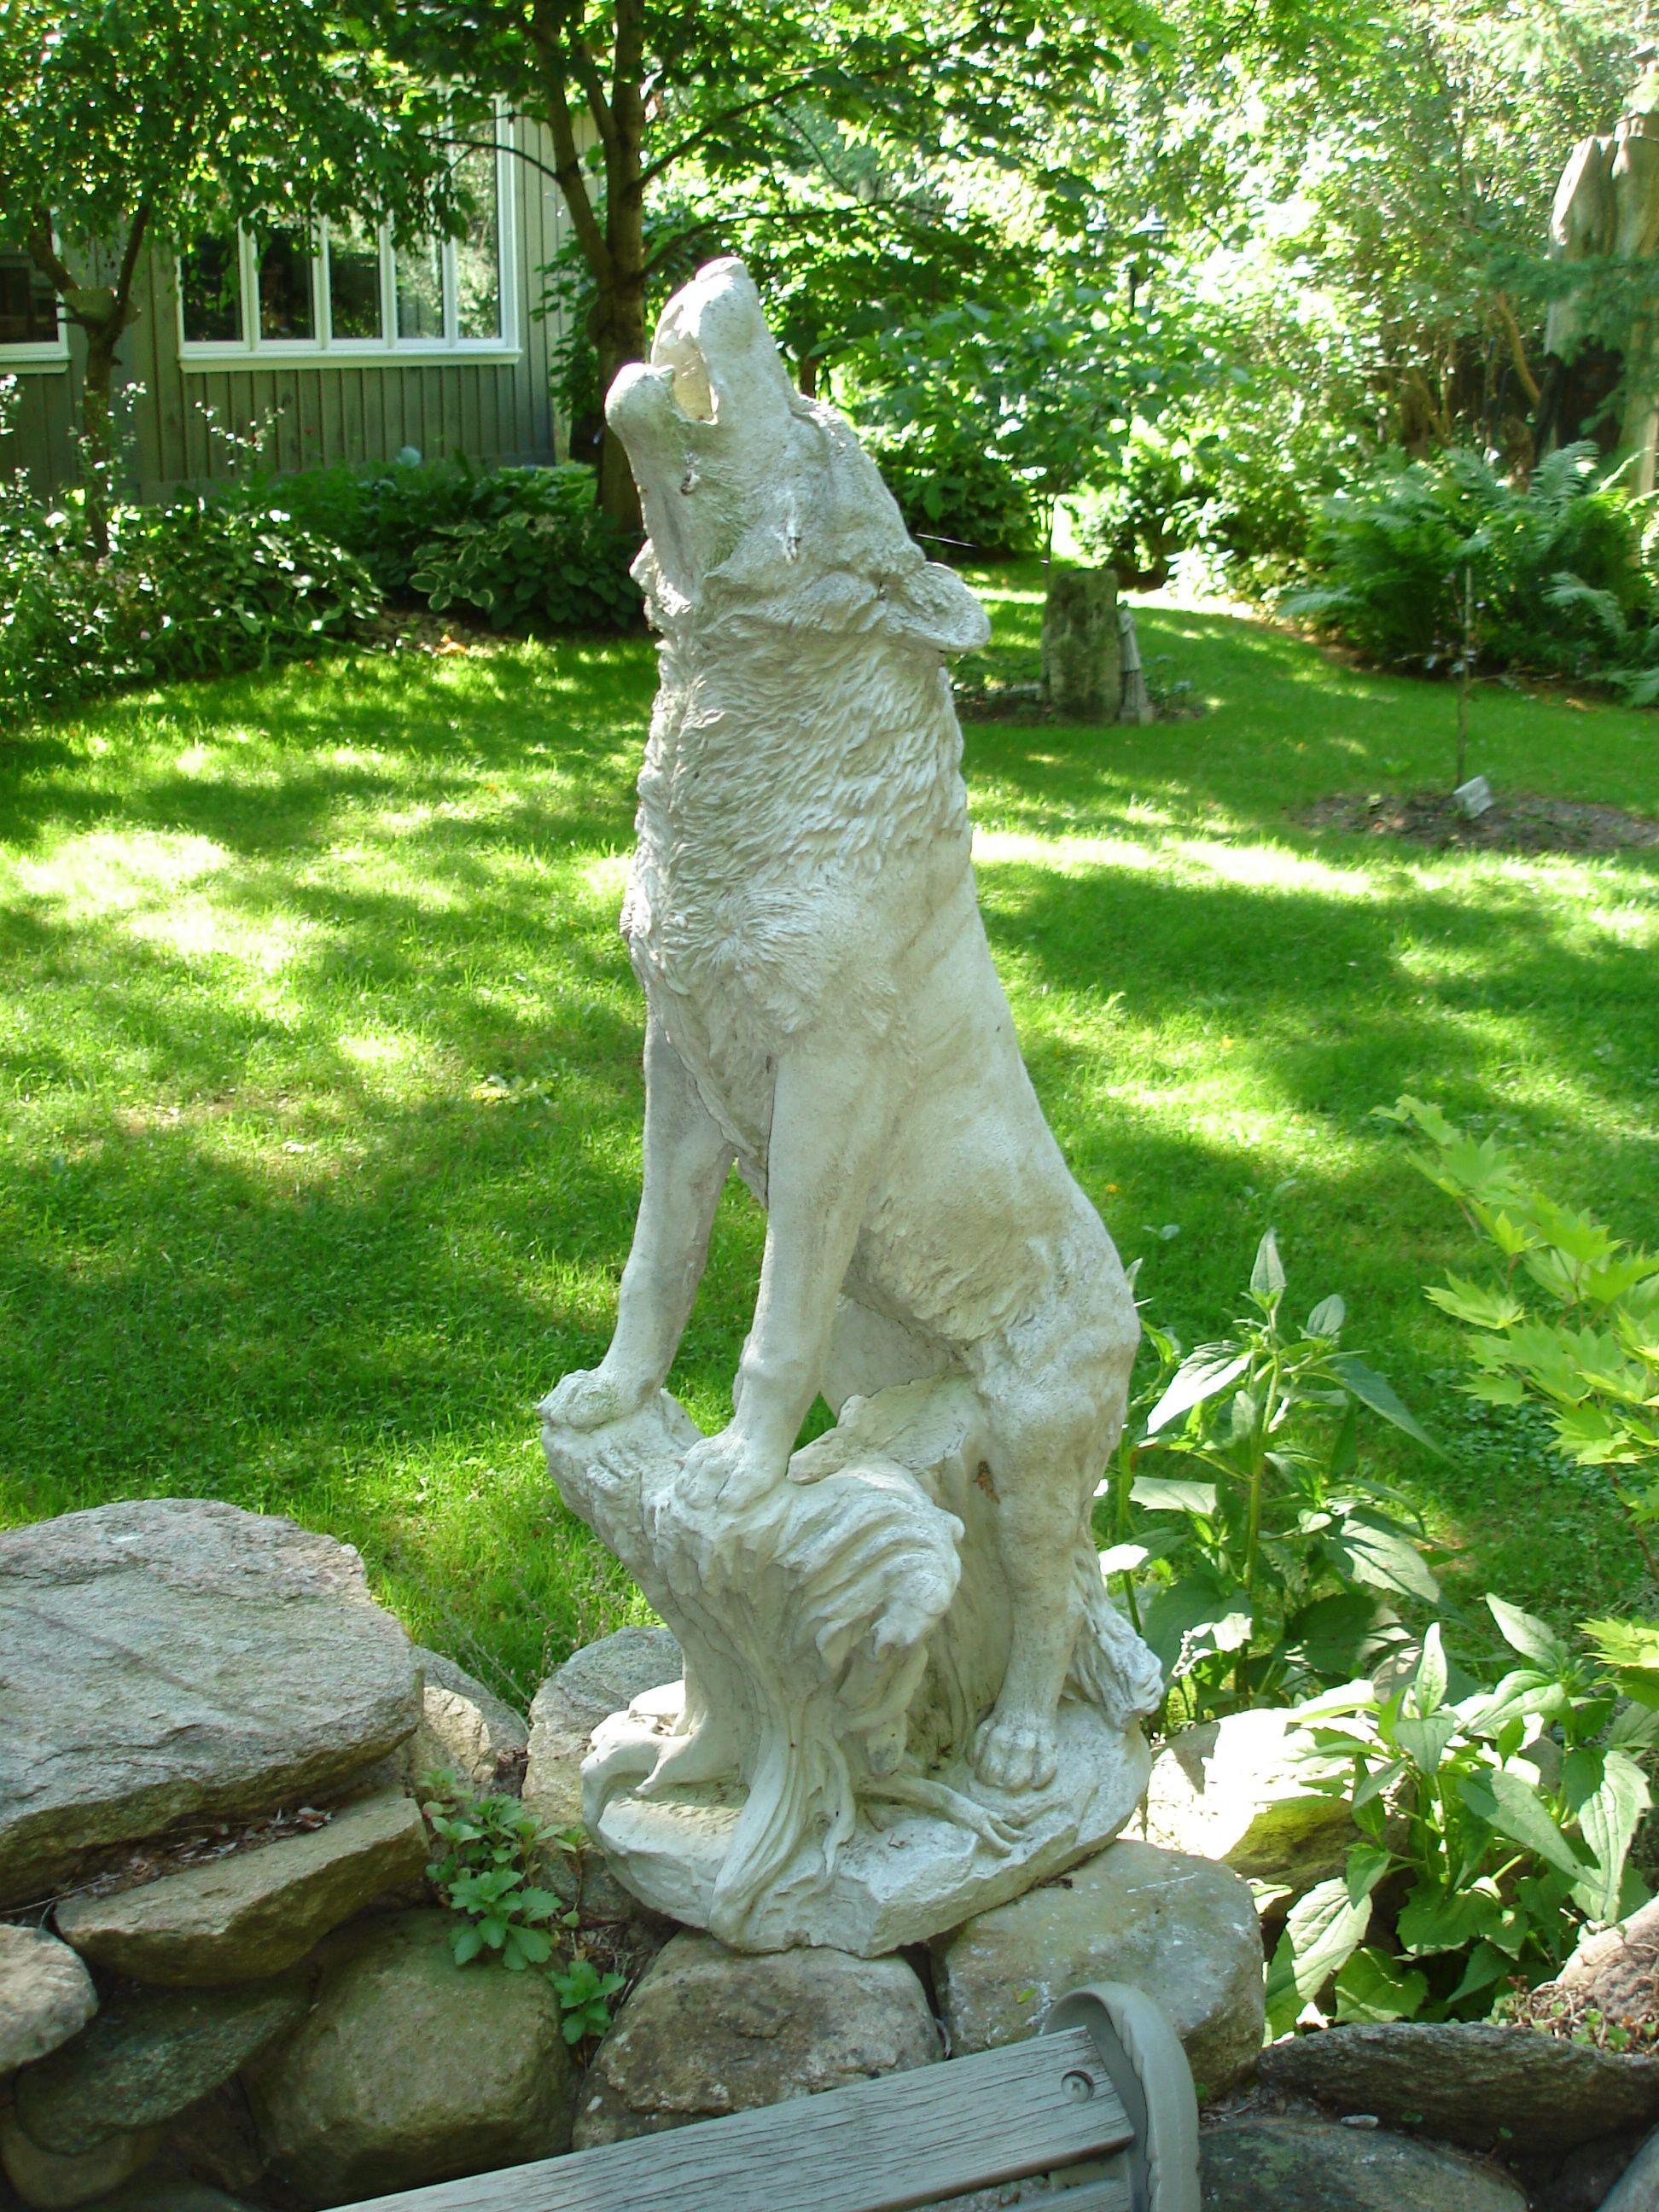 Merveilleux Howling Wolf Garden Statue, Ontario, Canada.